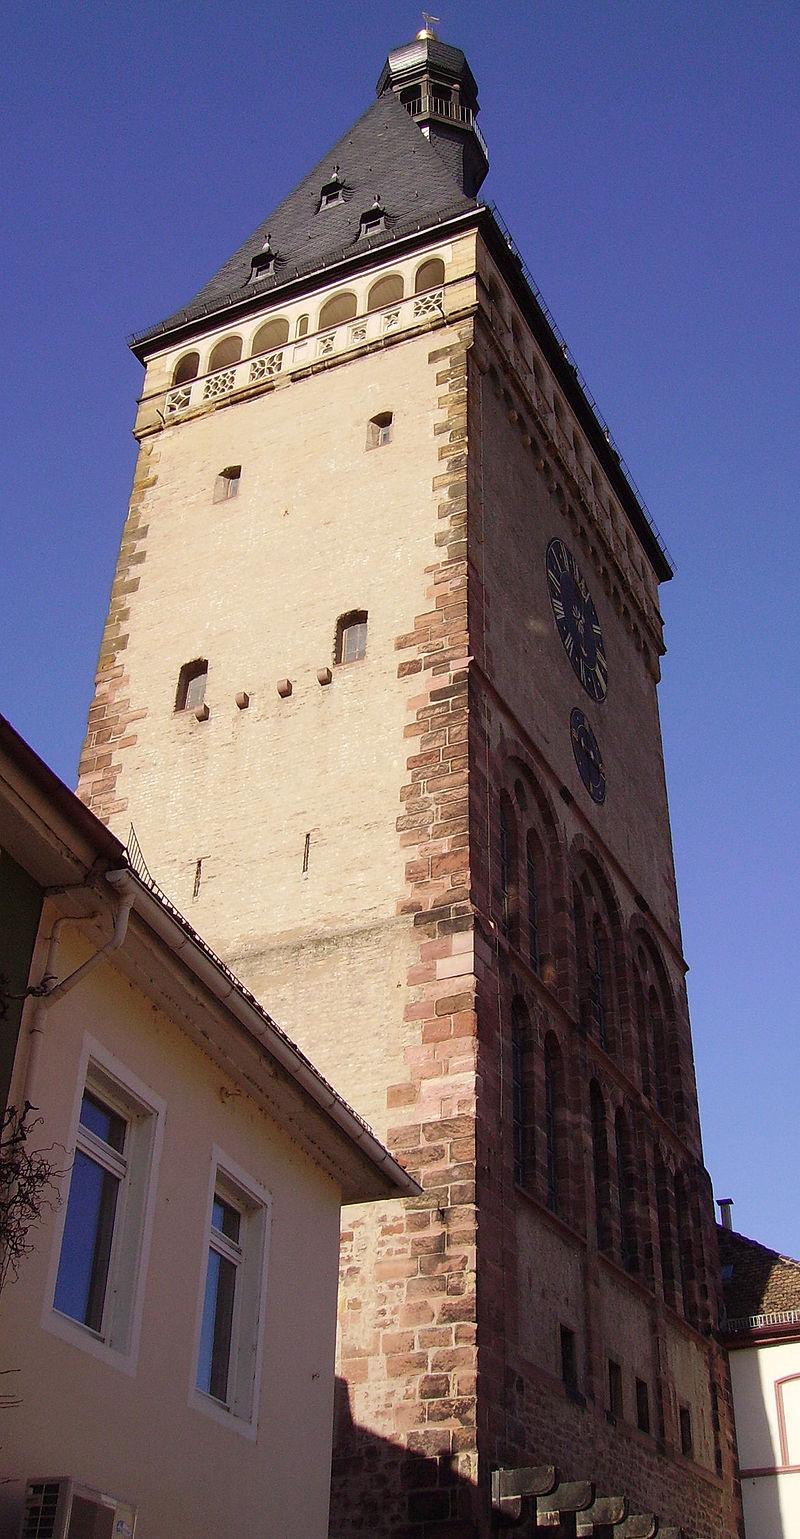 Bild Altpörtel Speyer